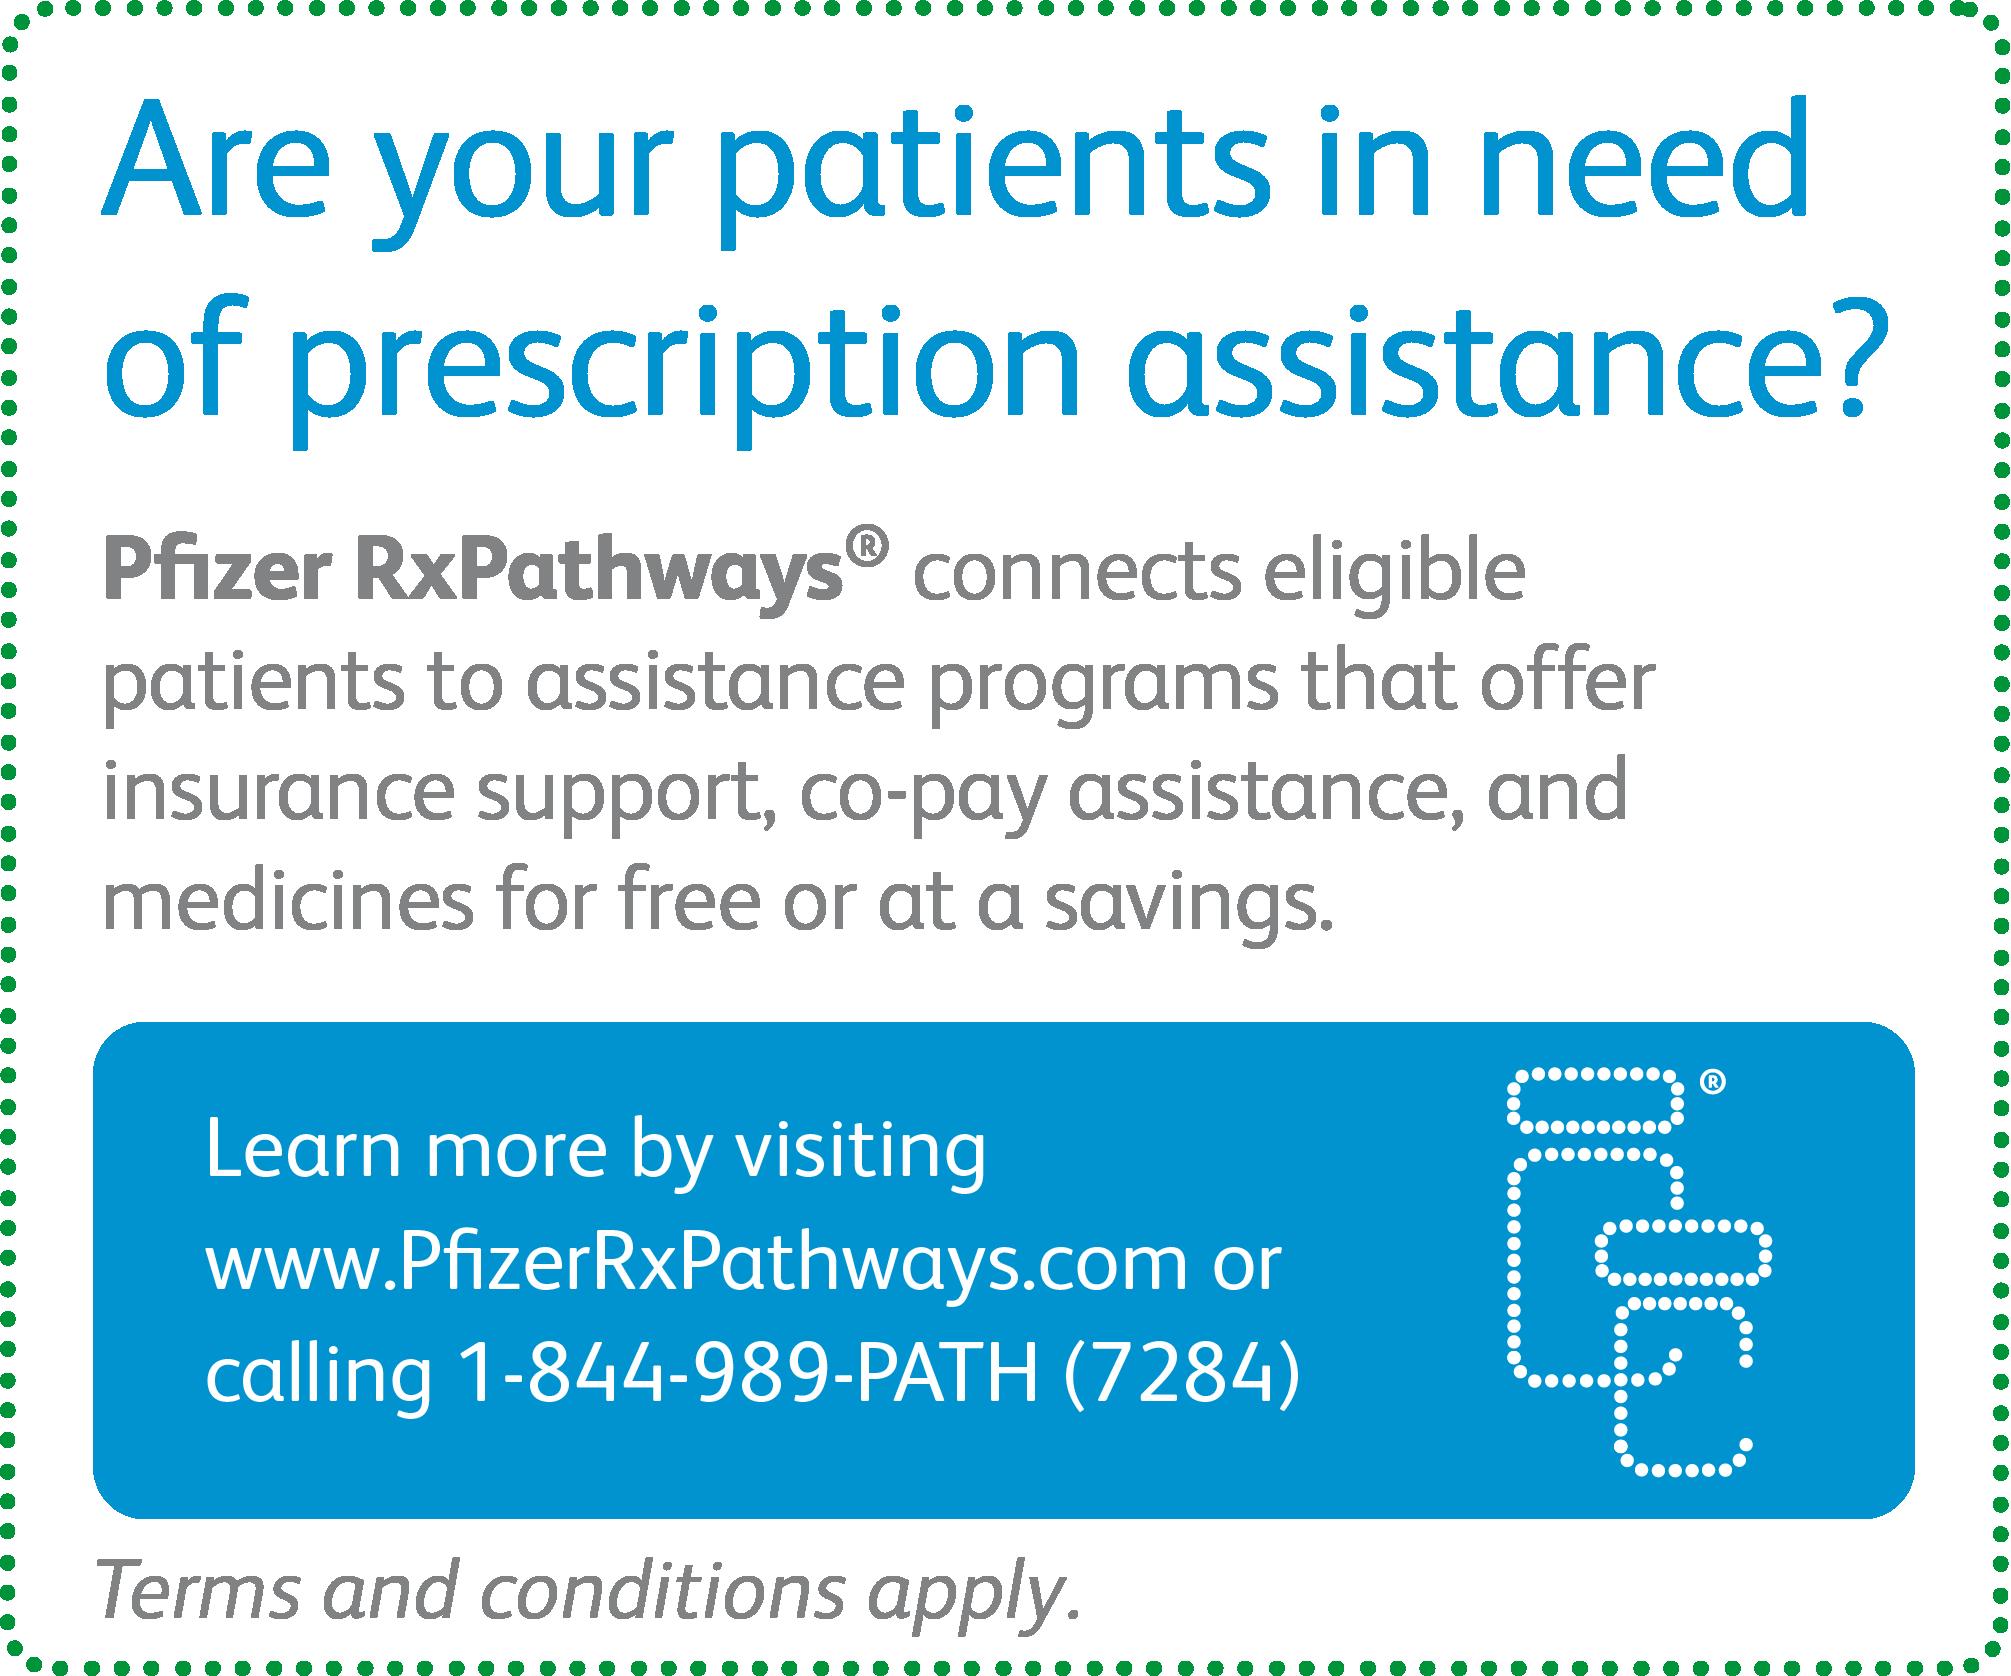 Learn more at PfizerRxPath.com